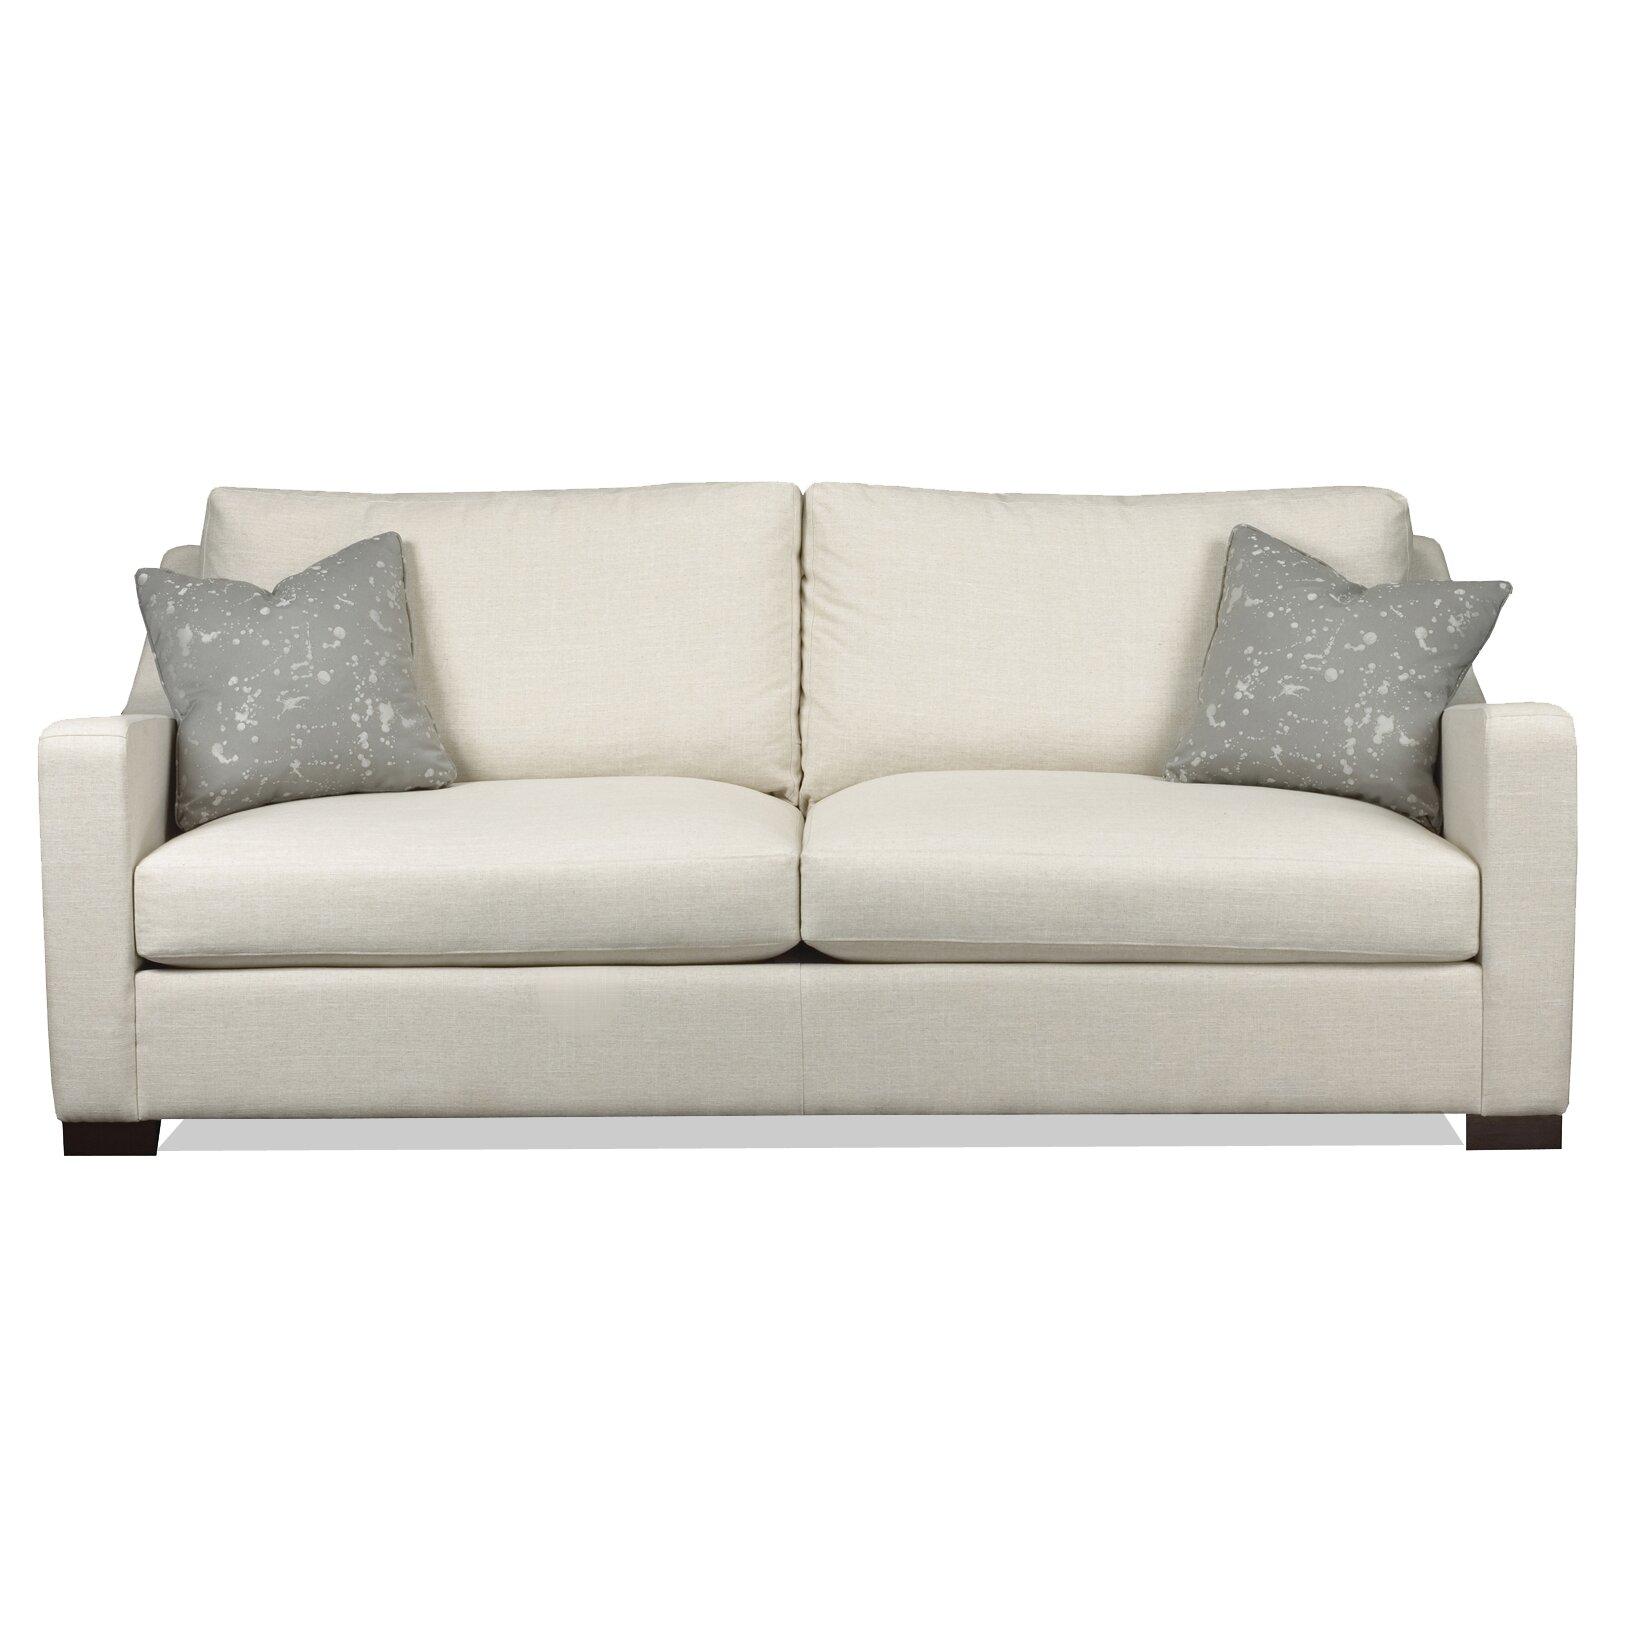 Brentwood Sofa Co hmmi